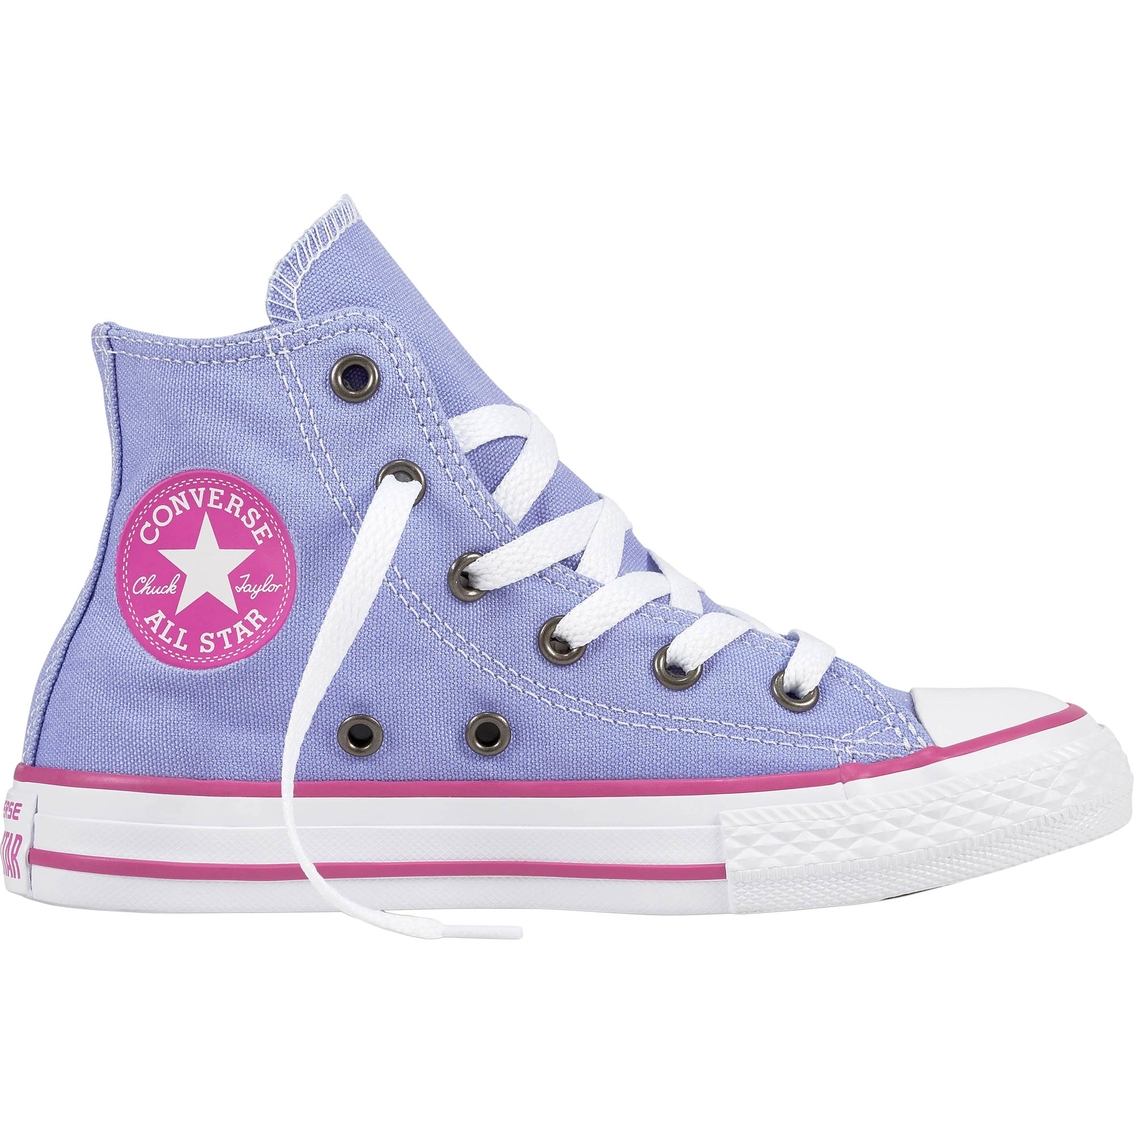 8630fe516500 Converse Preschool Girls Chuck Taylor All Star High Top Sneakers ...